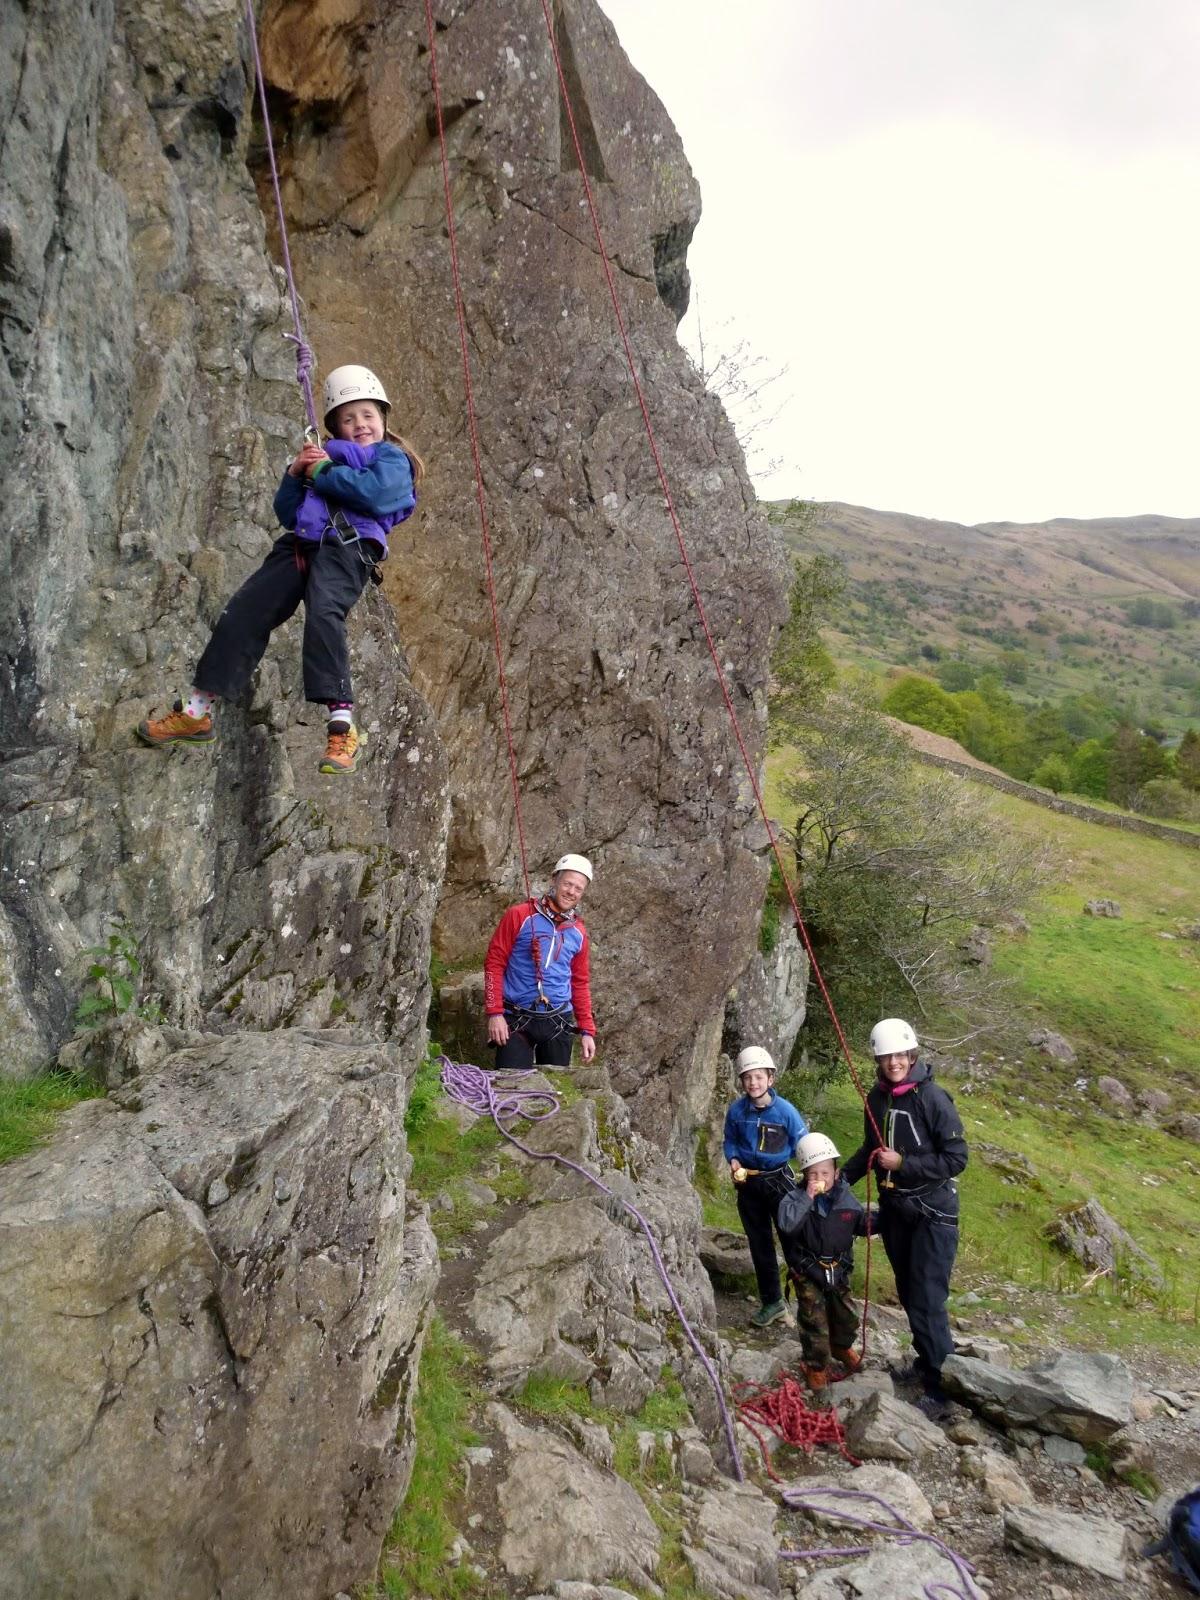 Outdoor Courses for Scrambling, Climbing, Kayaking & Mountain ...